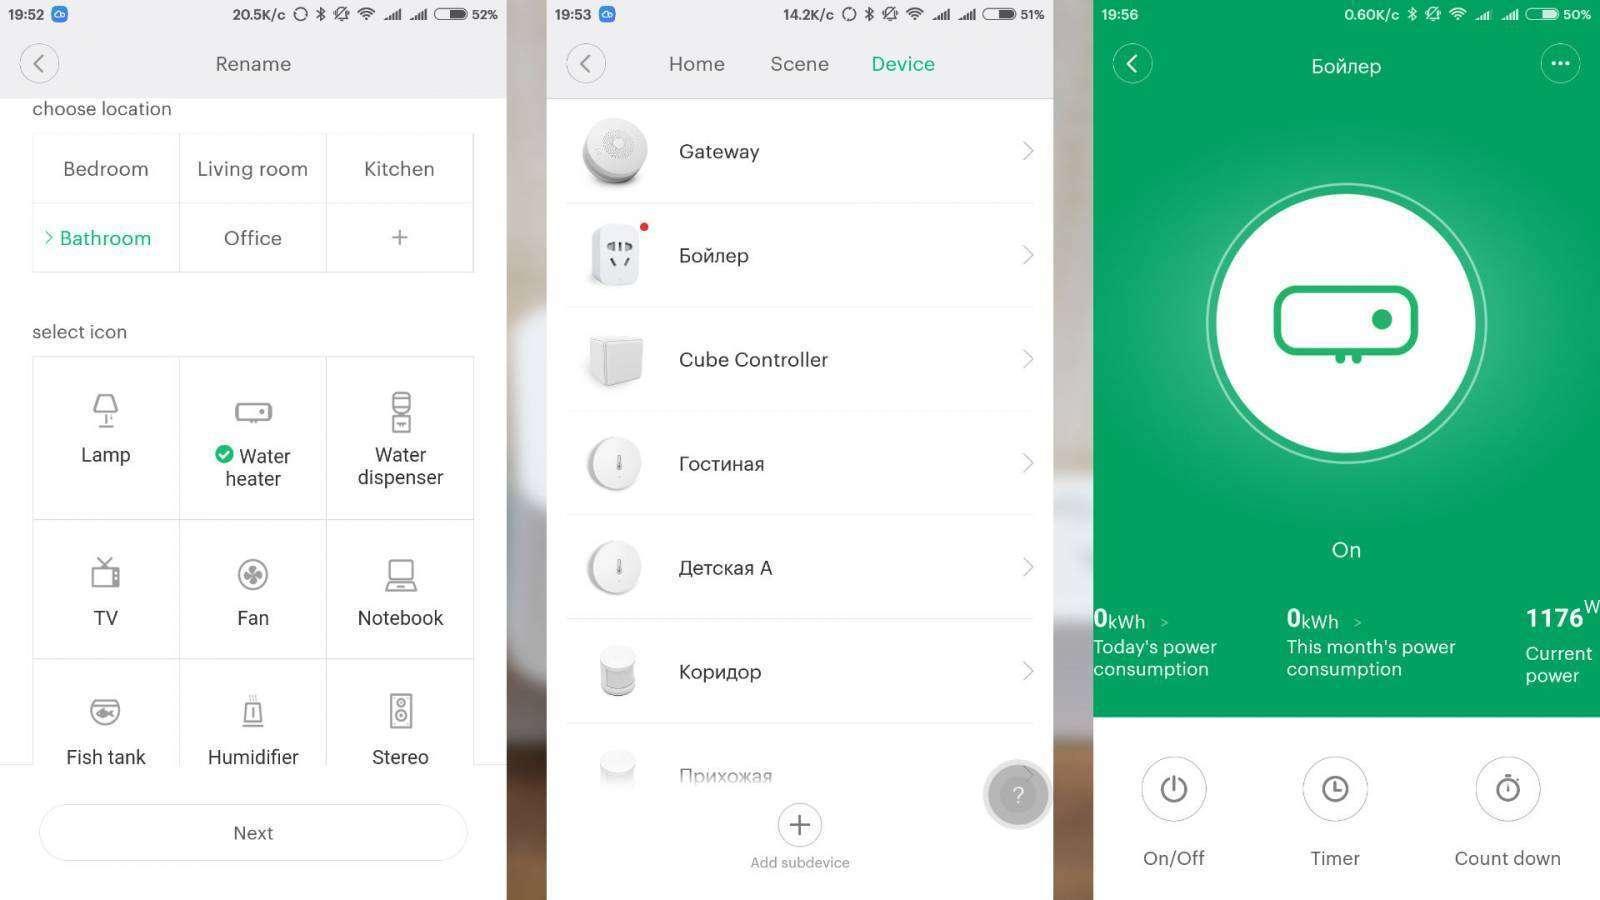 GearBest: Умная розетка Xiaomi Mi Smart, ZigBee версия - управляем бойлером